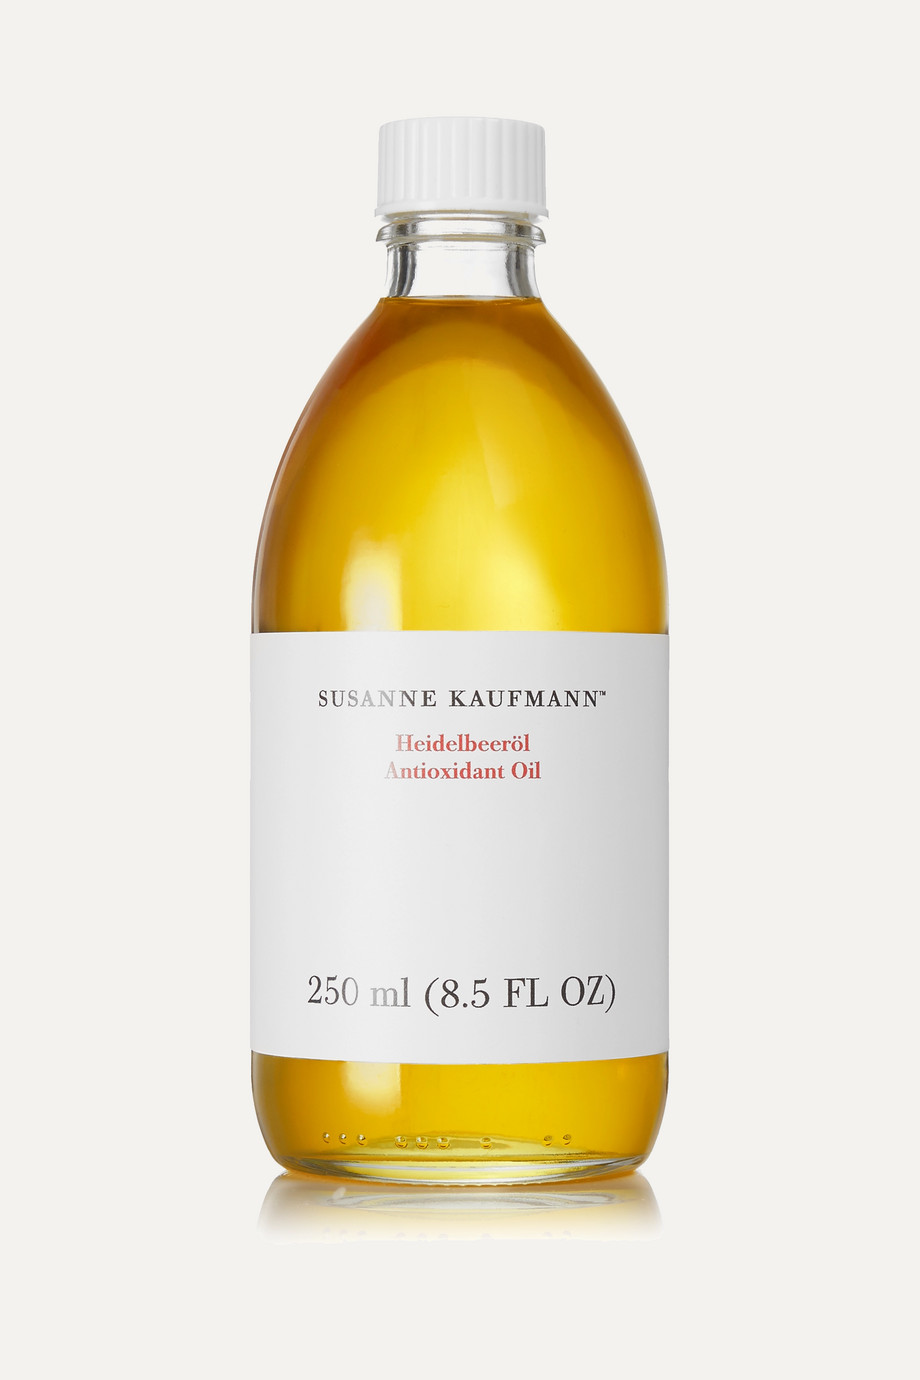 Susanne Kaufmann Antioxidant Oil, 250ml